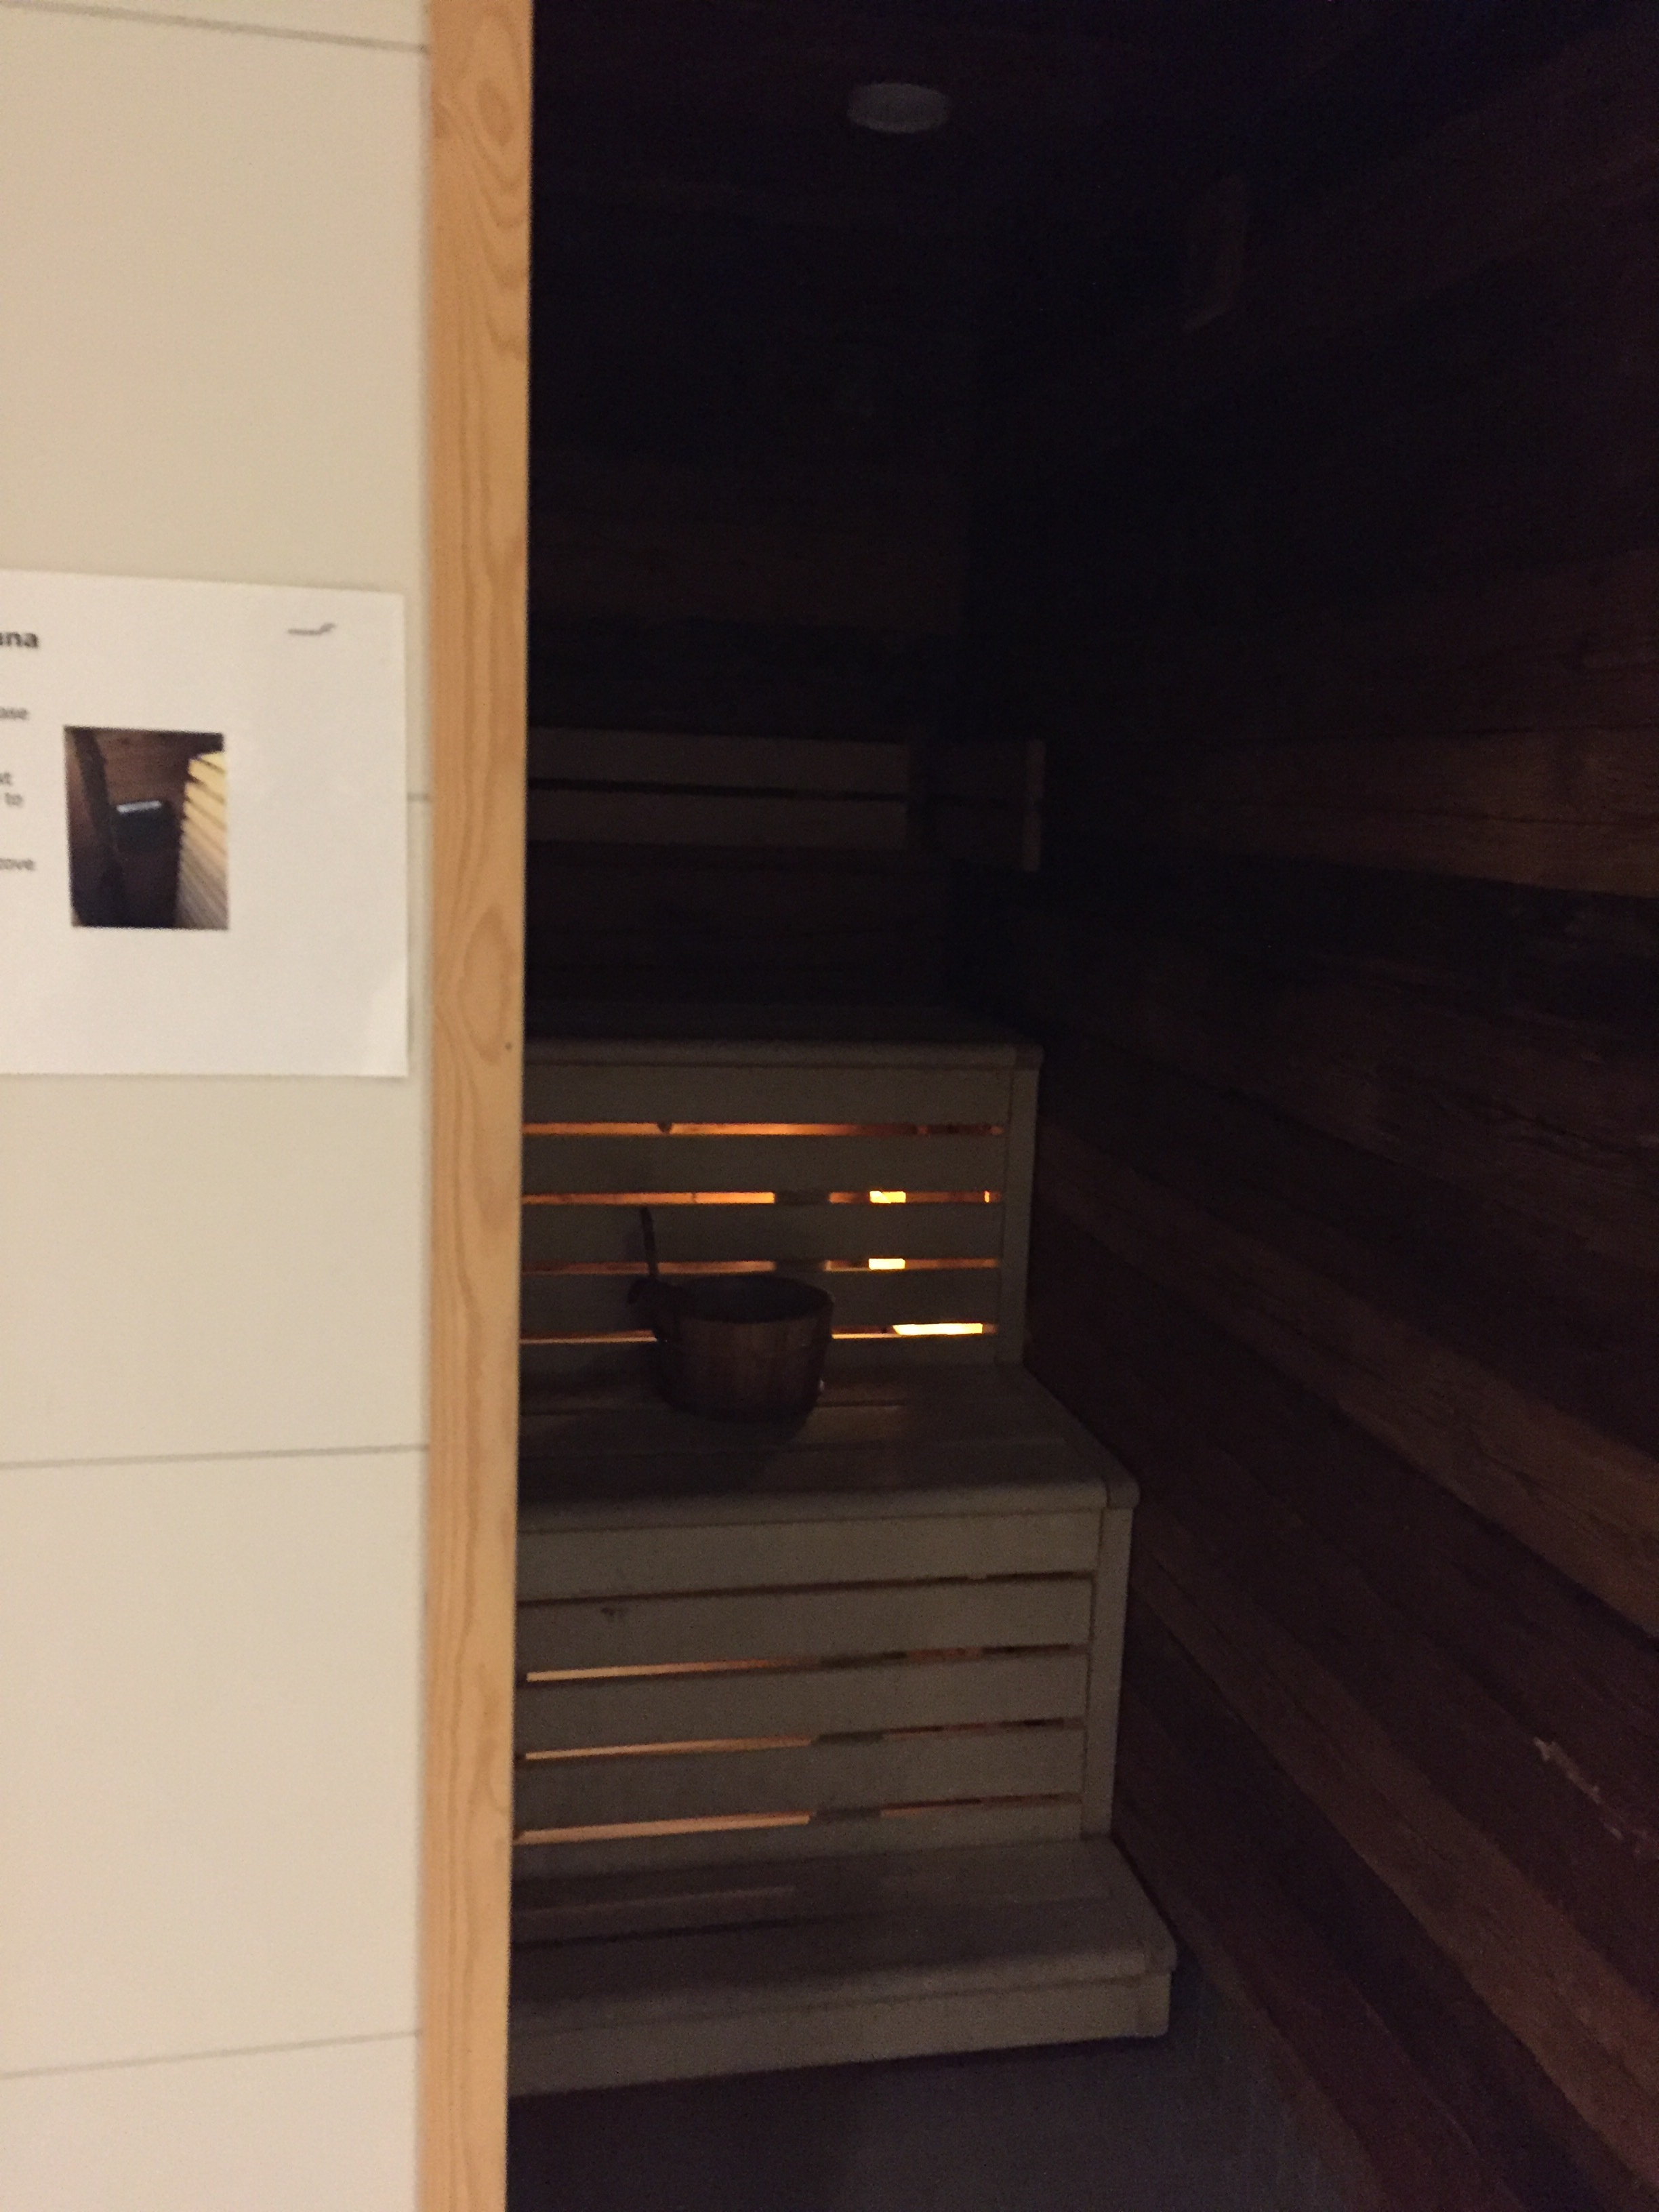 finnair sauna lounge.JPG